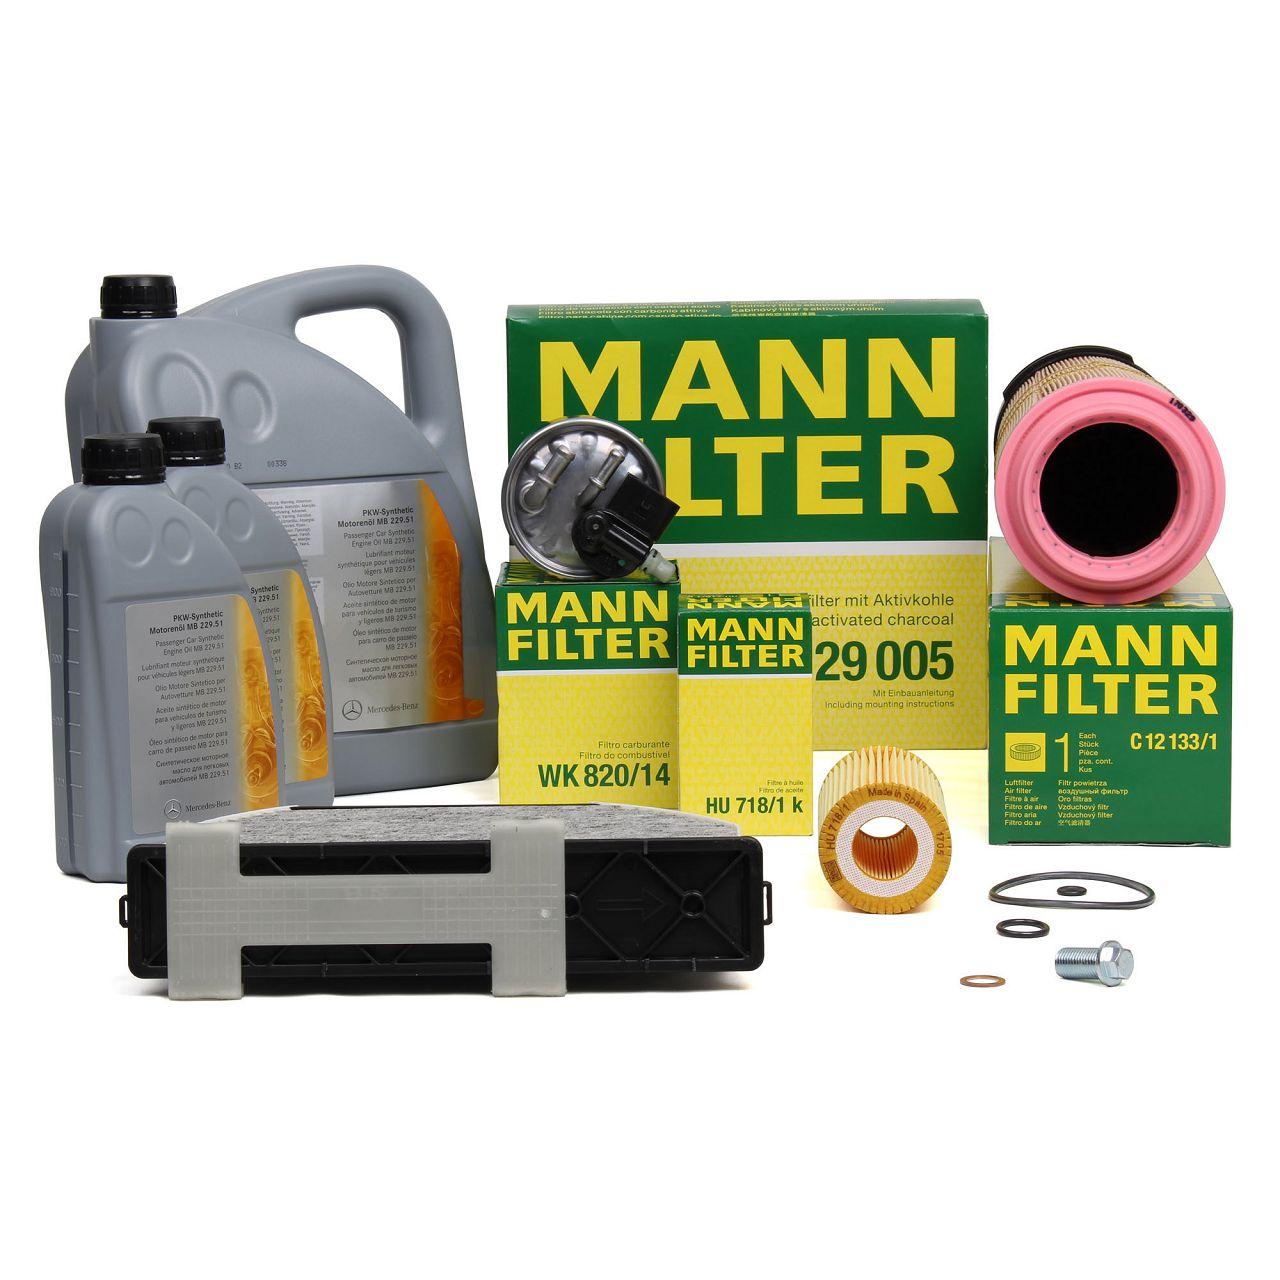 MANN Filterset 4-tlg + 7L ORIGINAL 5W30 Motoröl Mercedes-Benz W204 C220CDI OM646